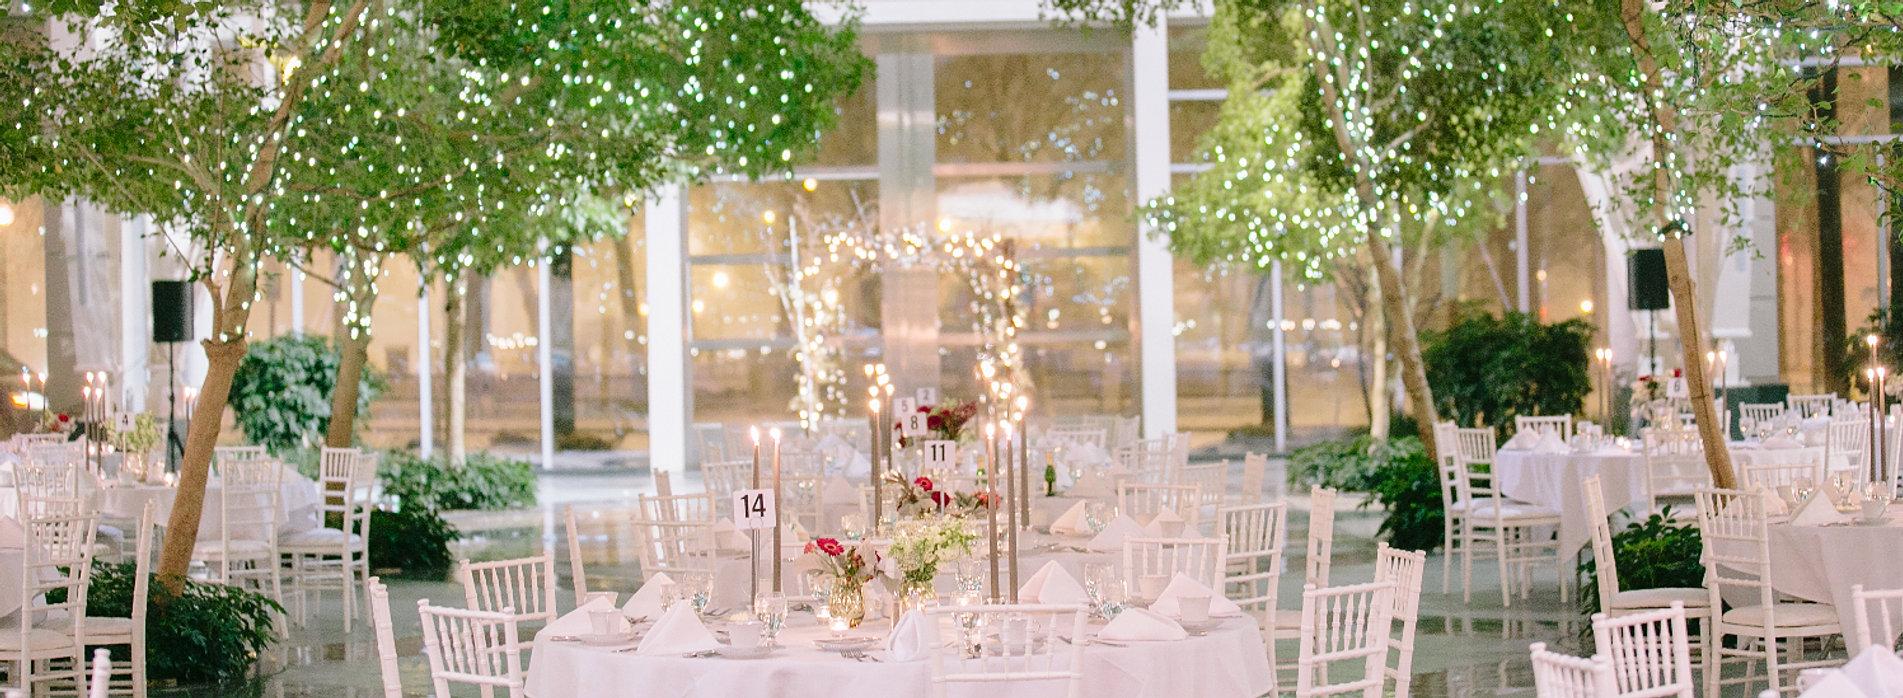 Wedding Amp Event Venue Downtown Rochester The Wintergarden